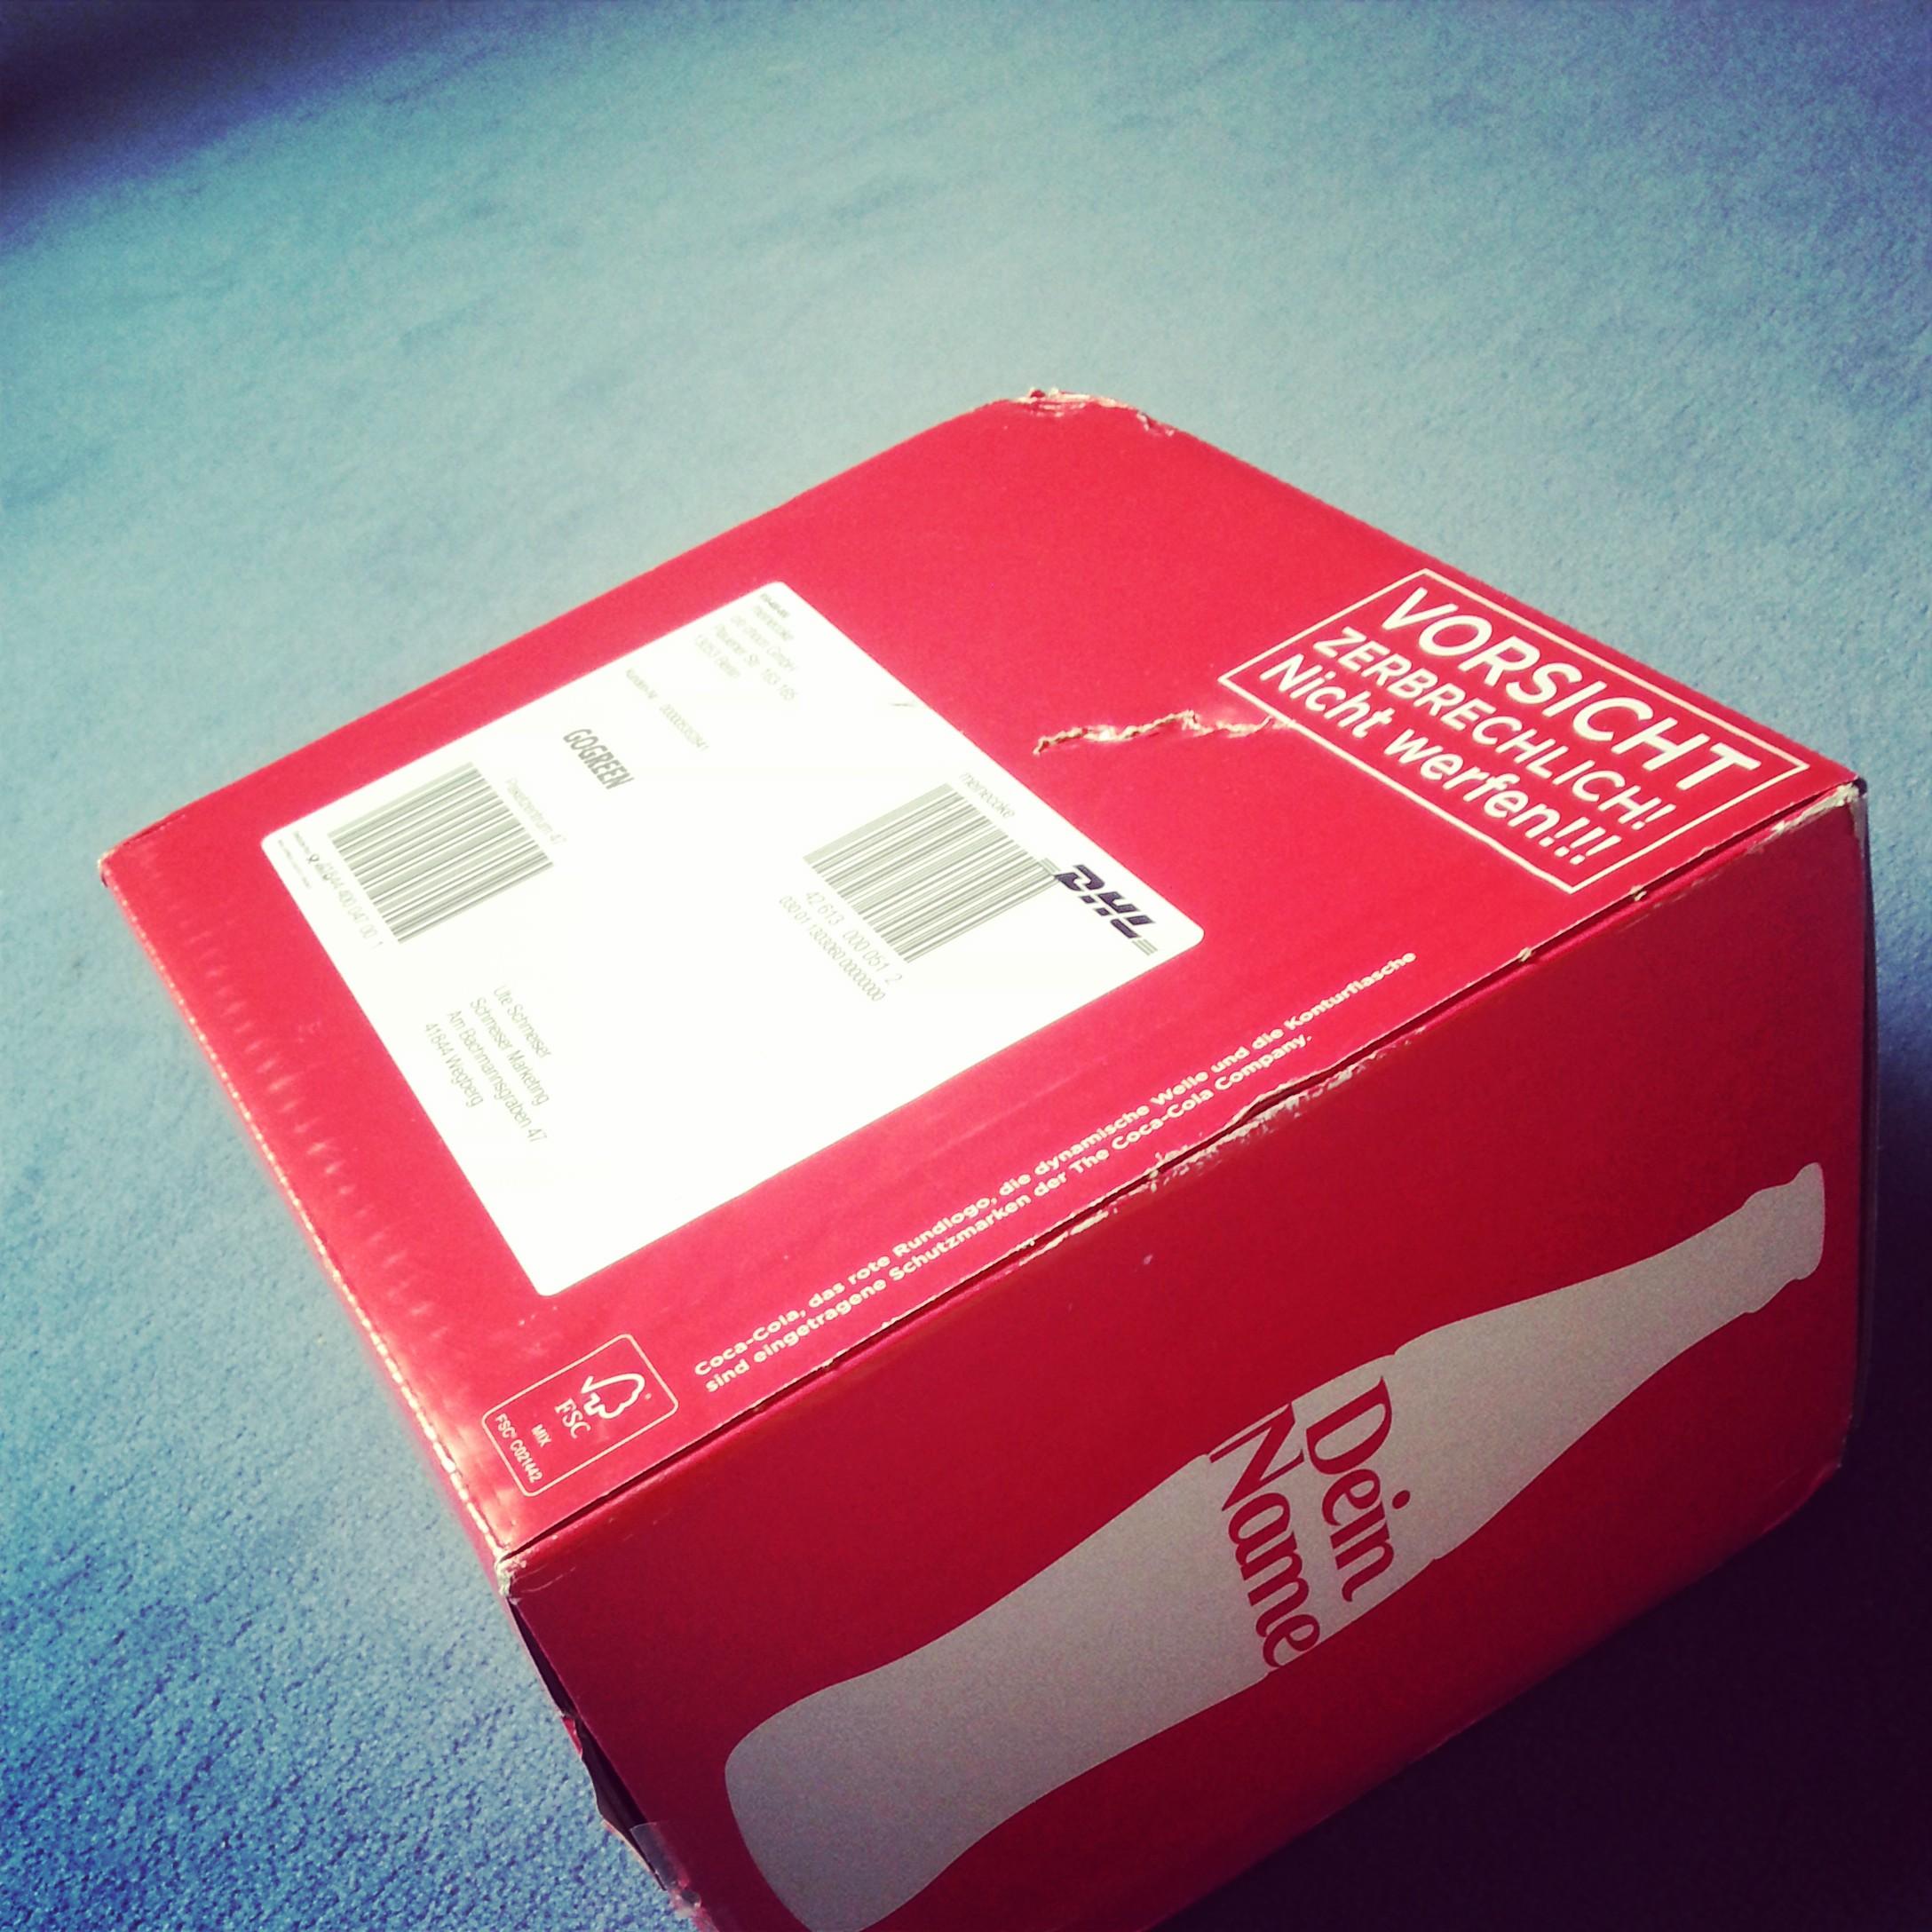 Coca Cola Paket kommt an